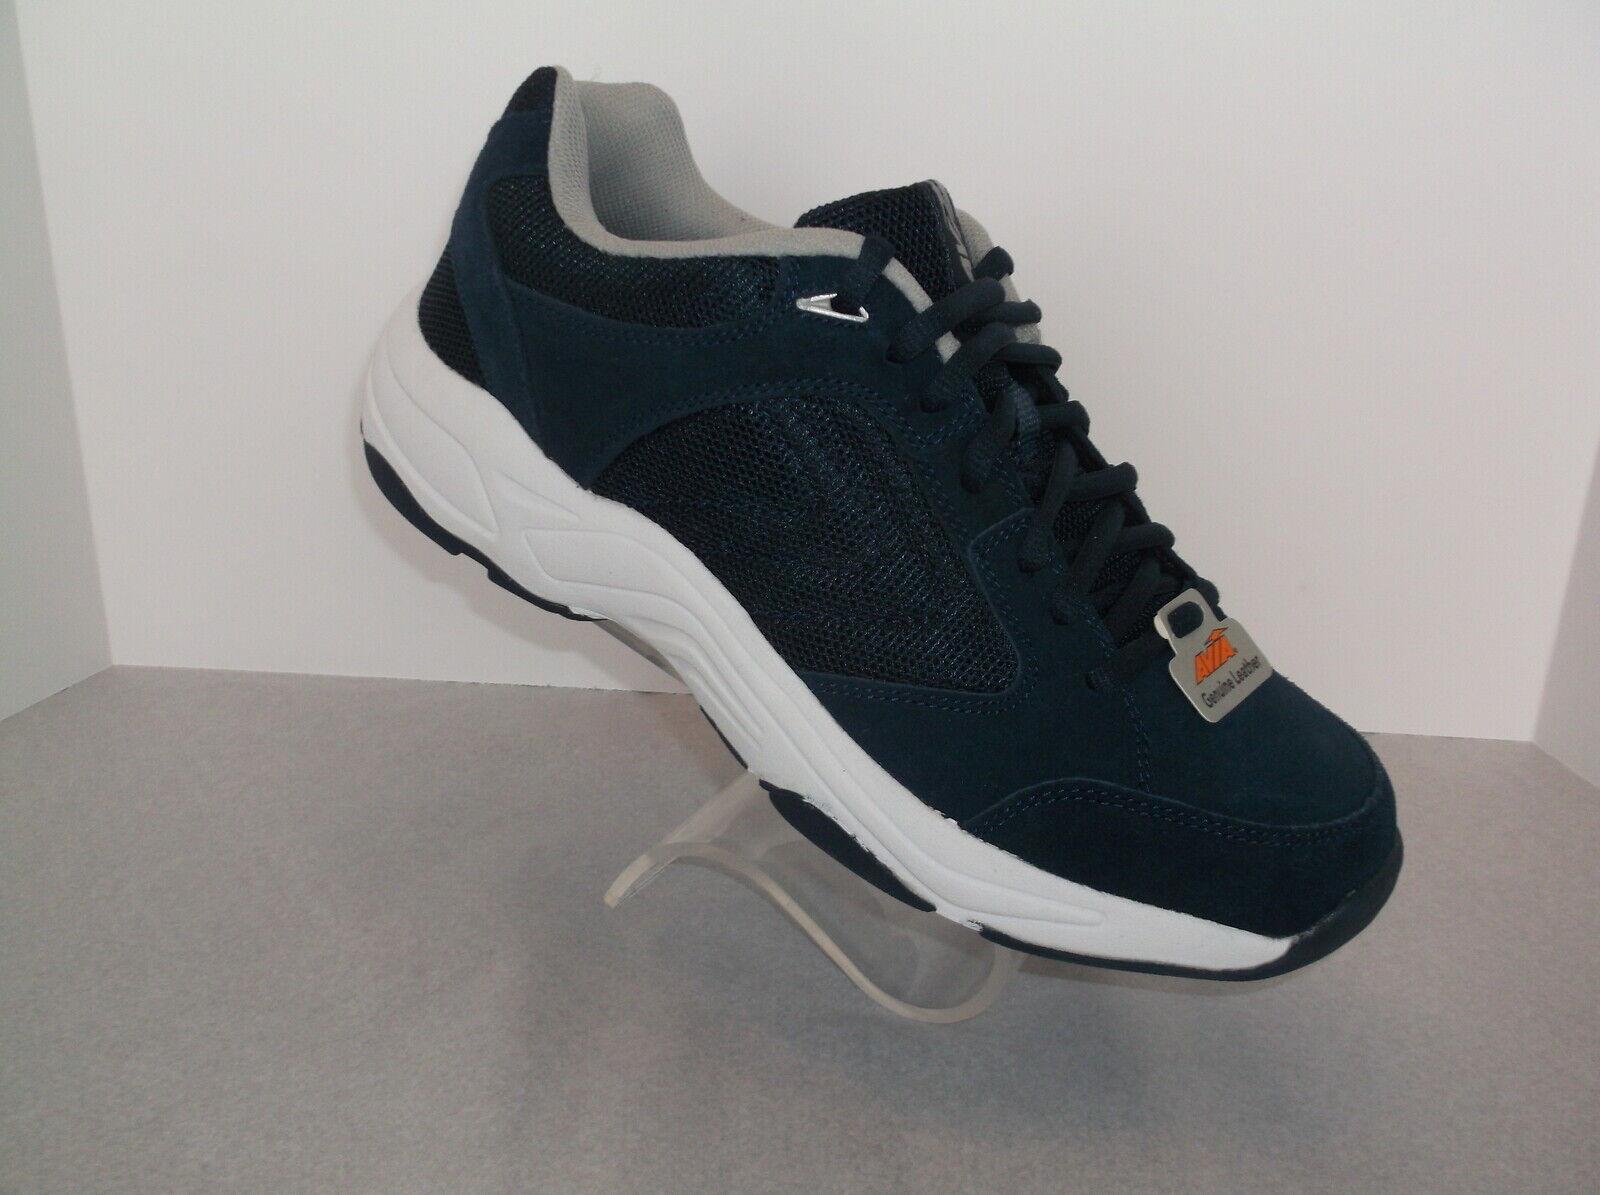 Avia Men's Caged Jogger Shoe for sale